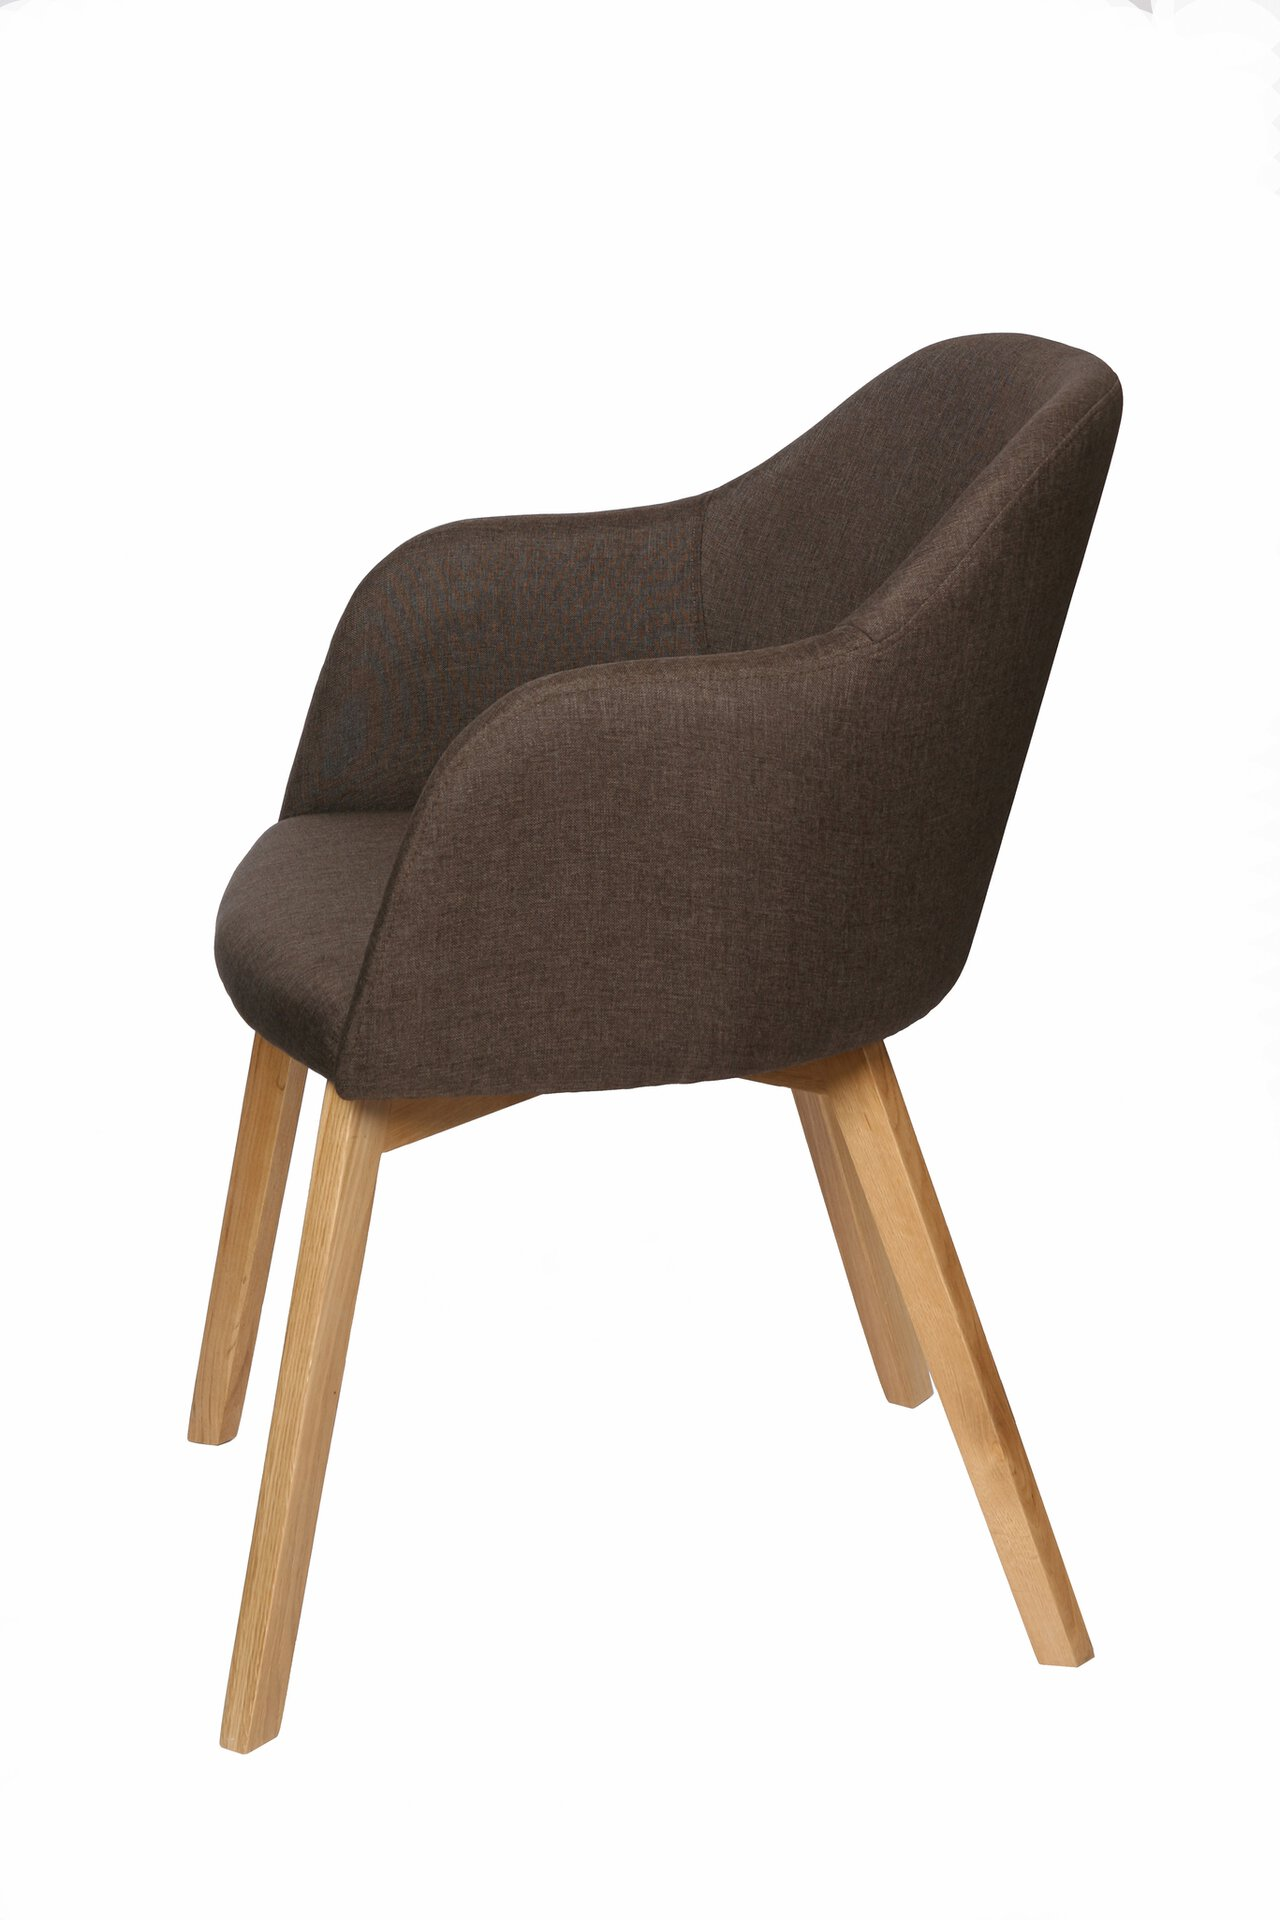 Stuhl NESA Vito Textil mehrfarbig 64 x 83 x 60 cm